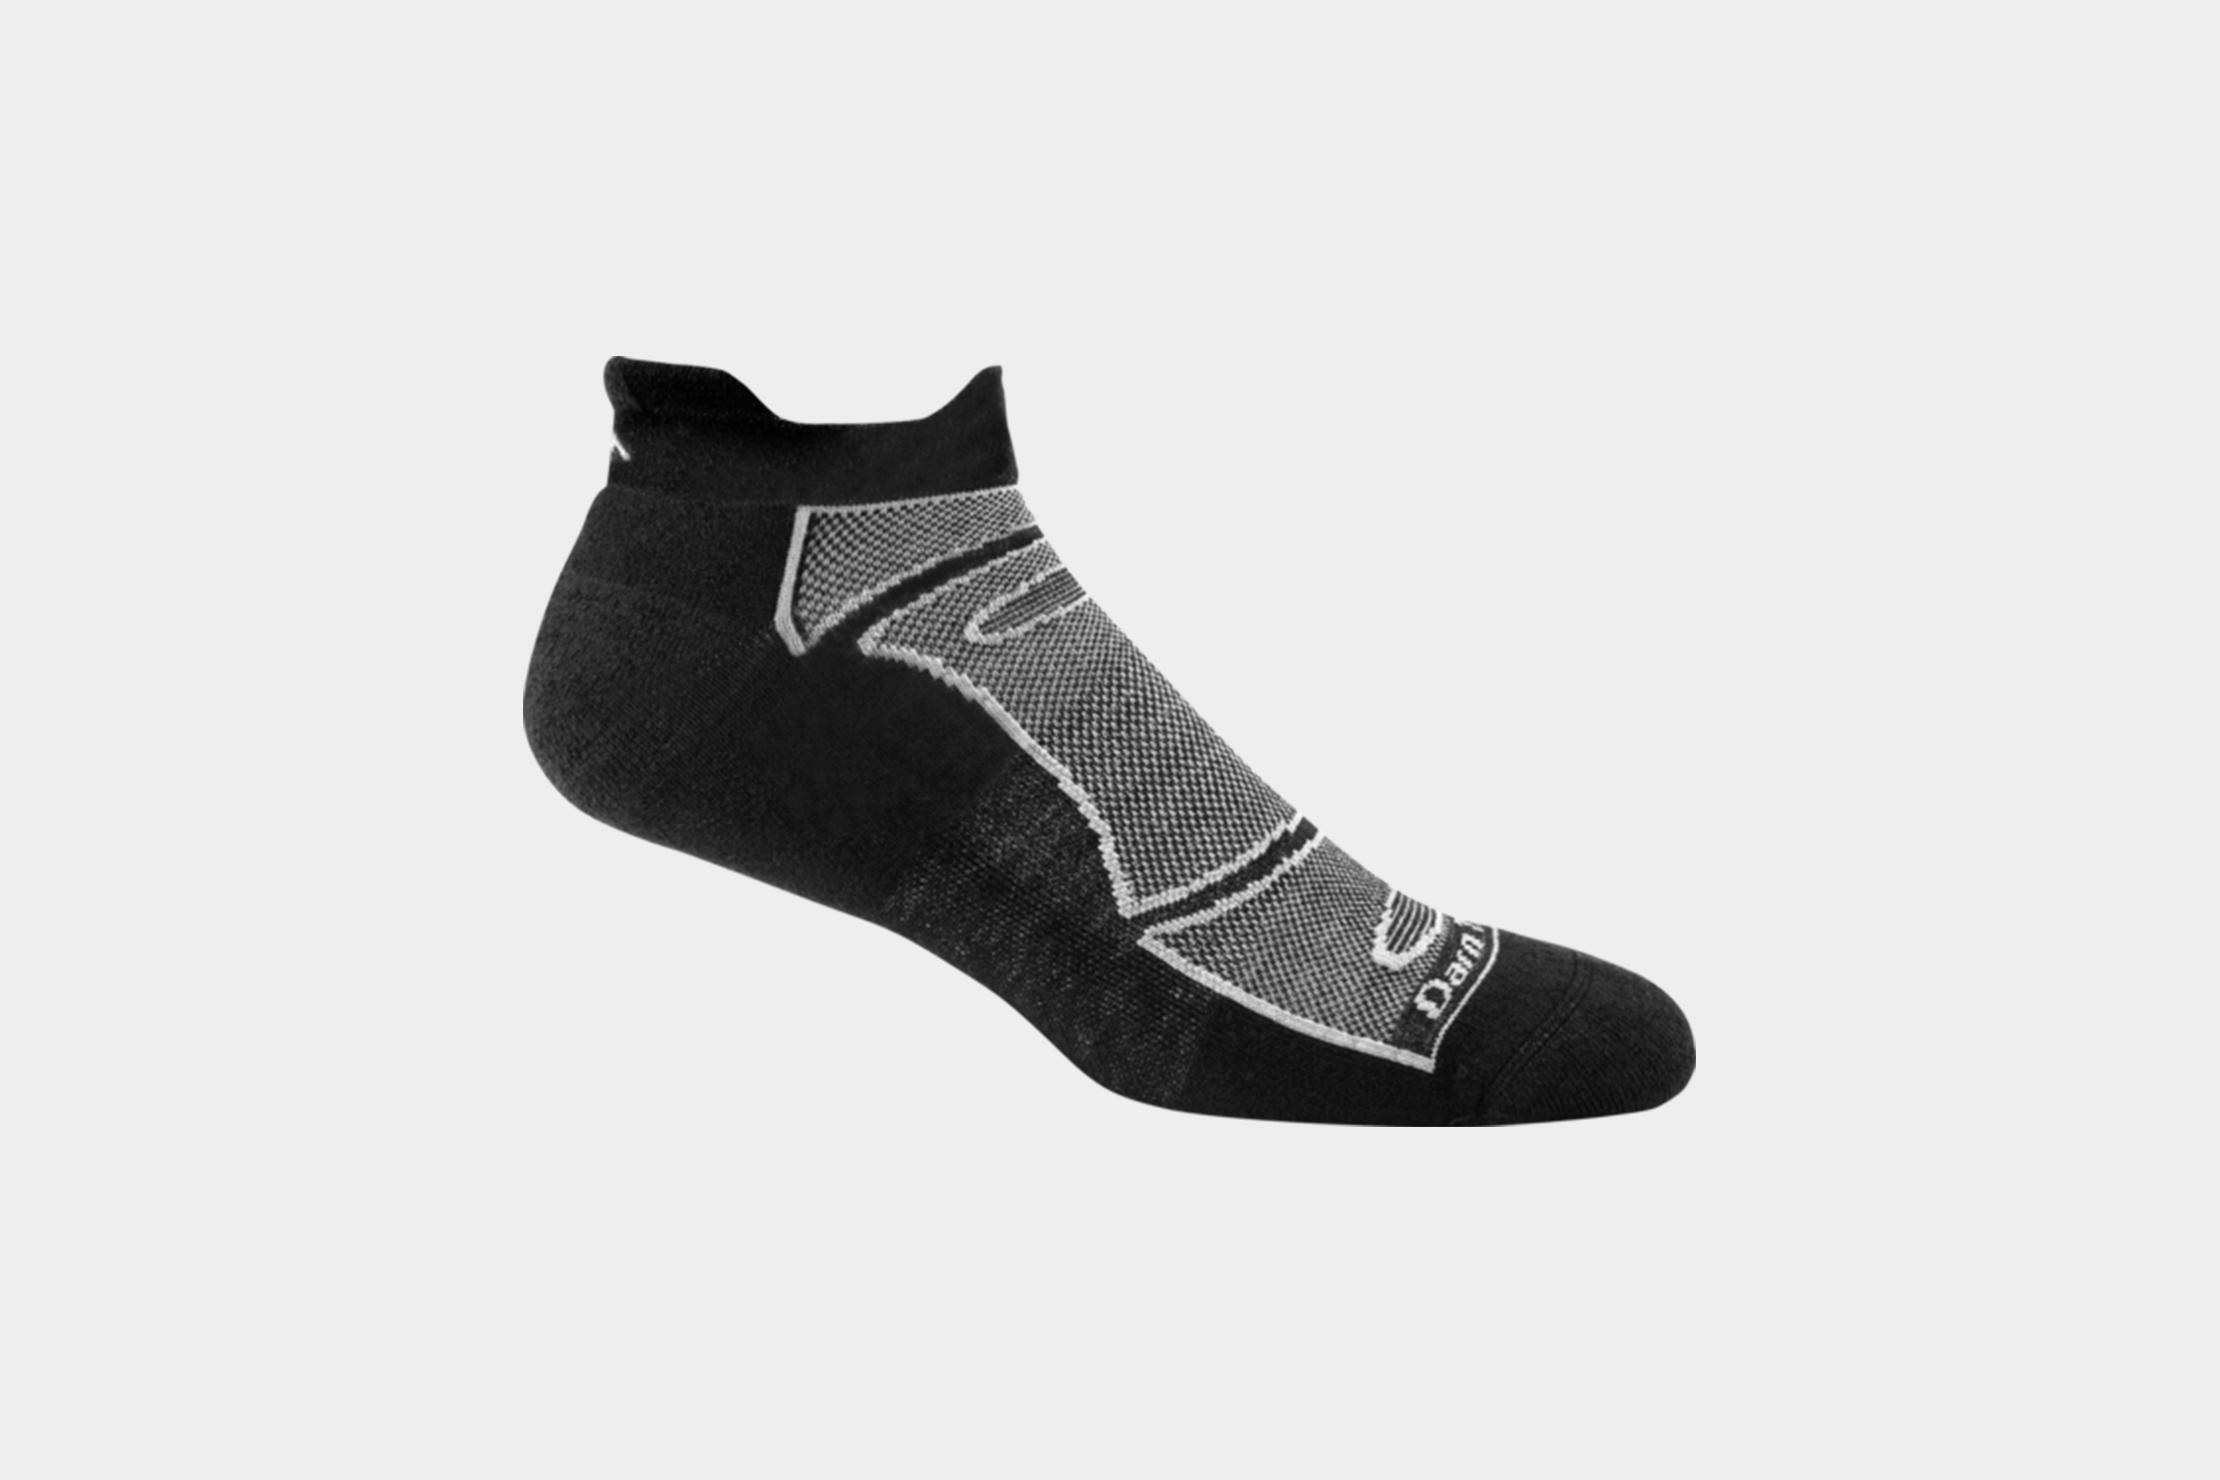 Darn Tough Merino Wool Socks Review